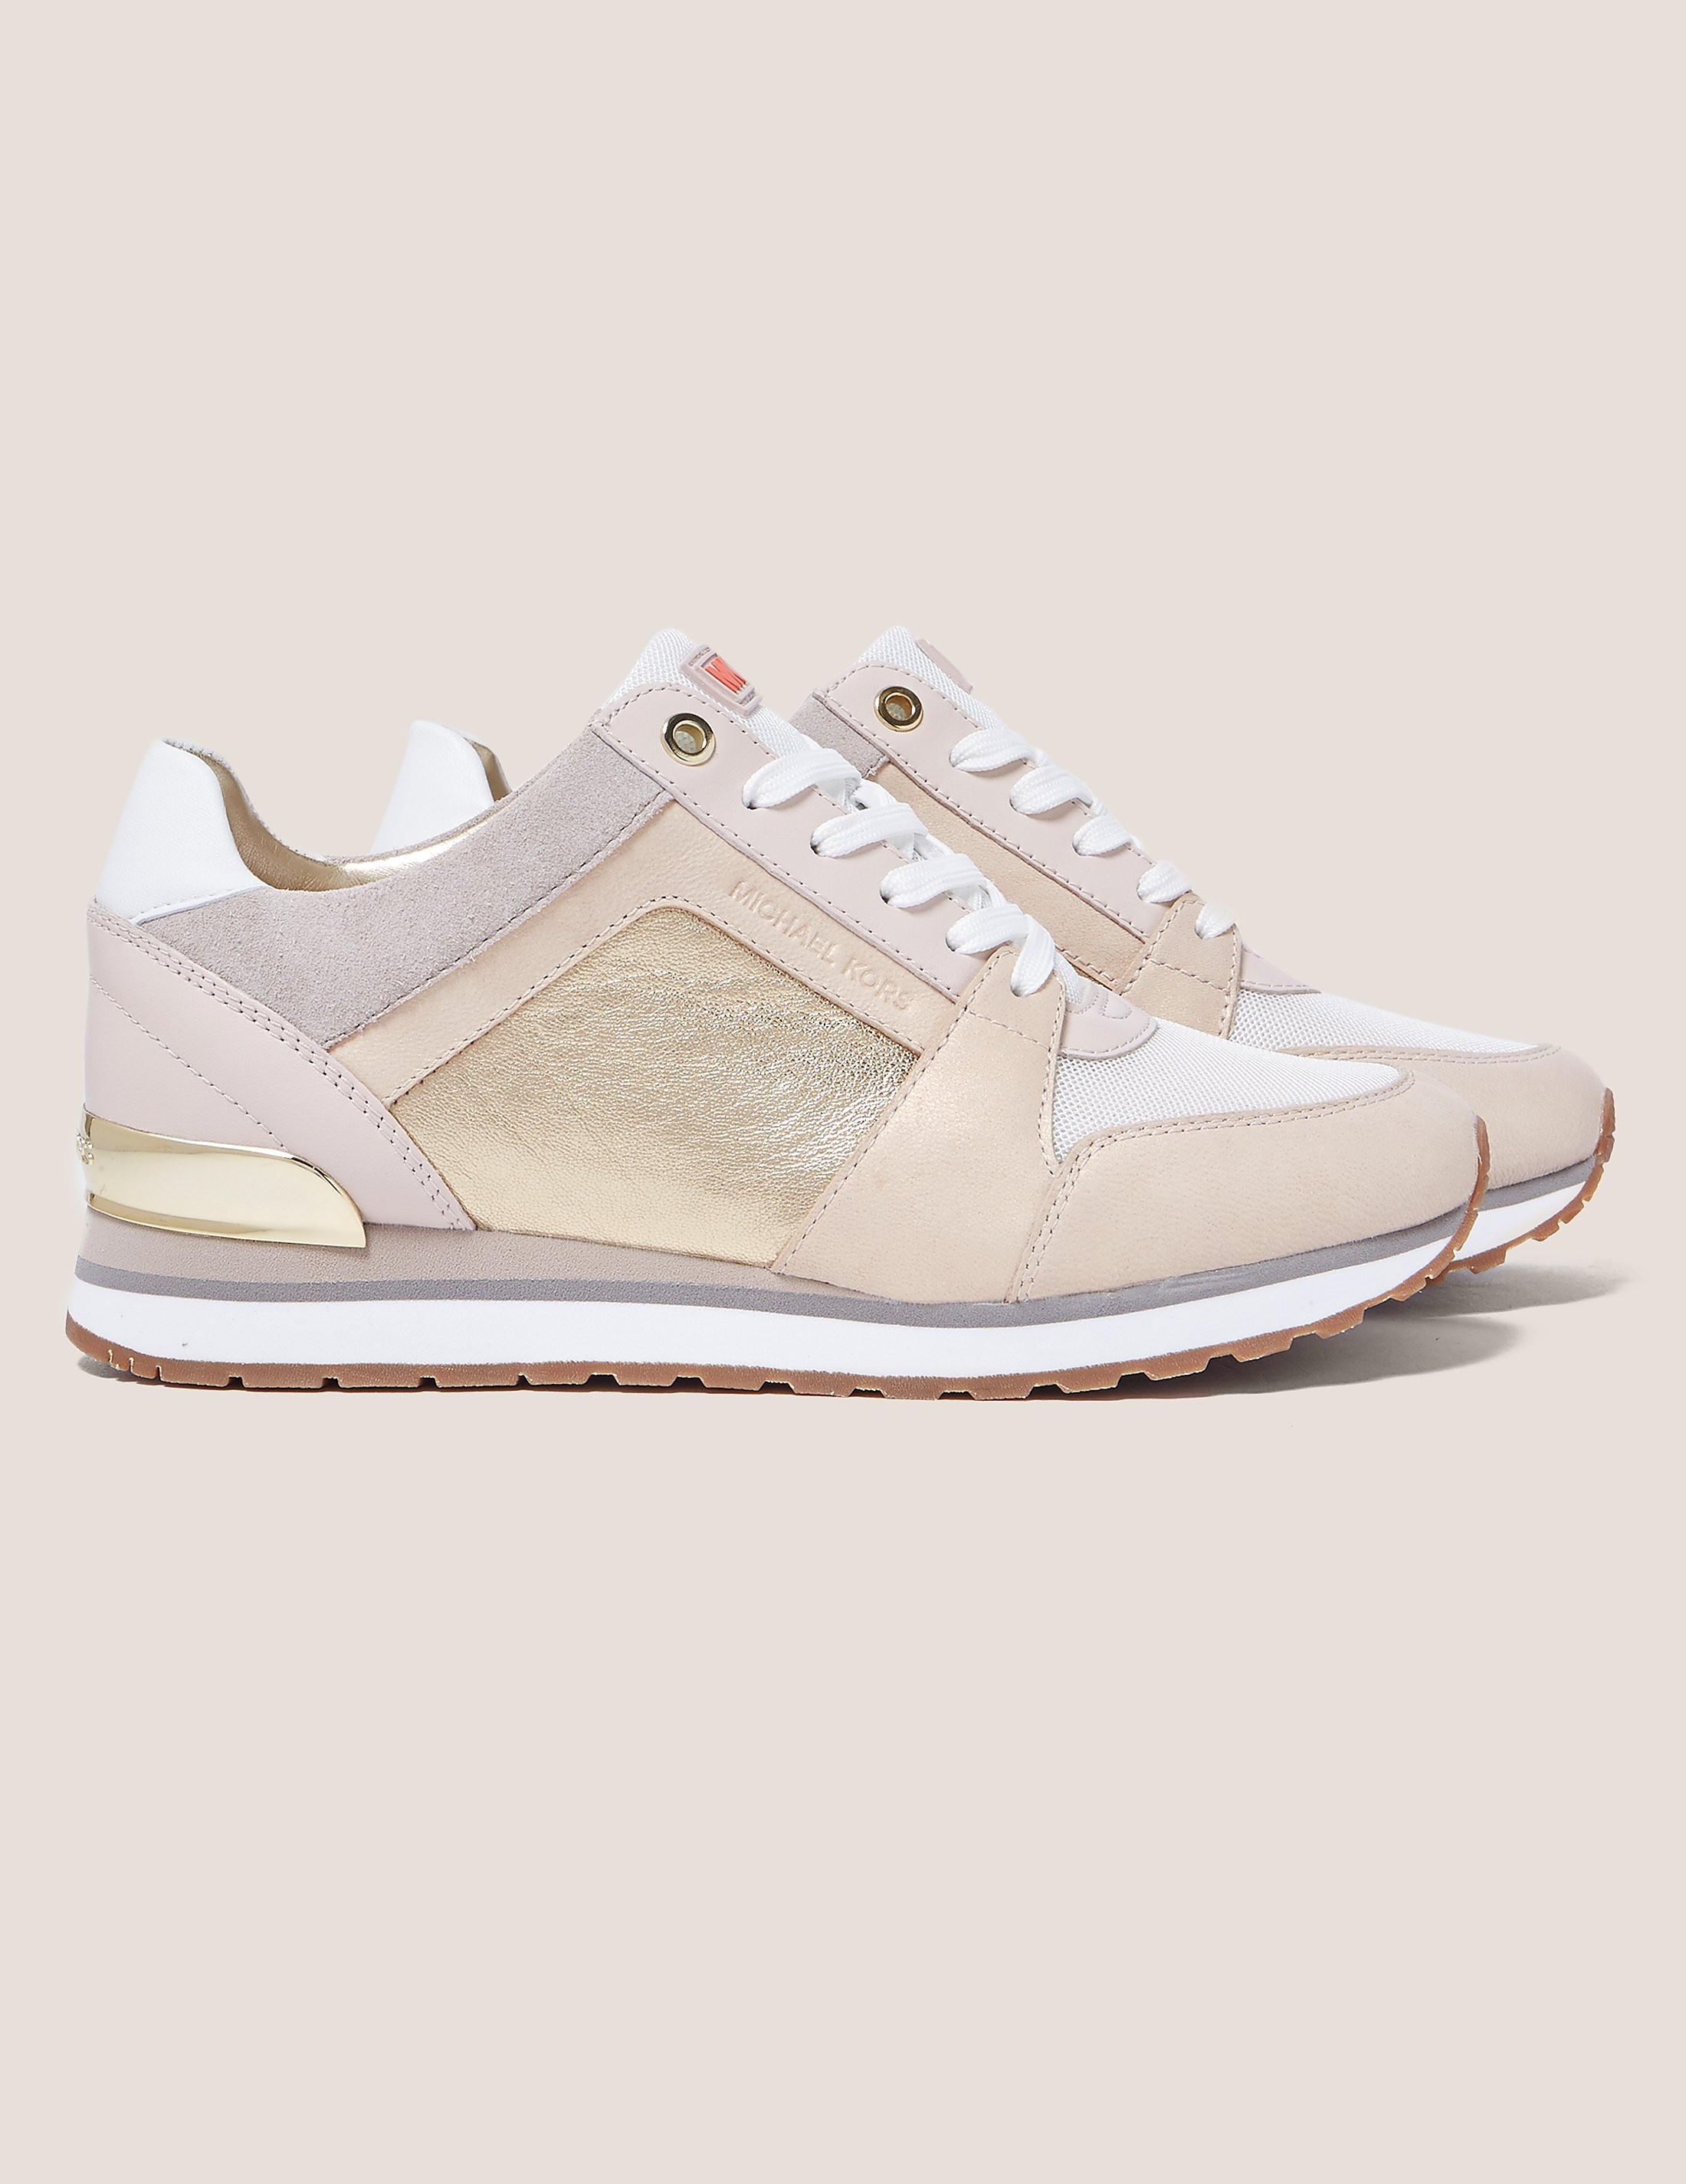 Michael Kors Bille Sneakers